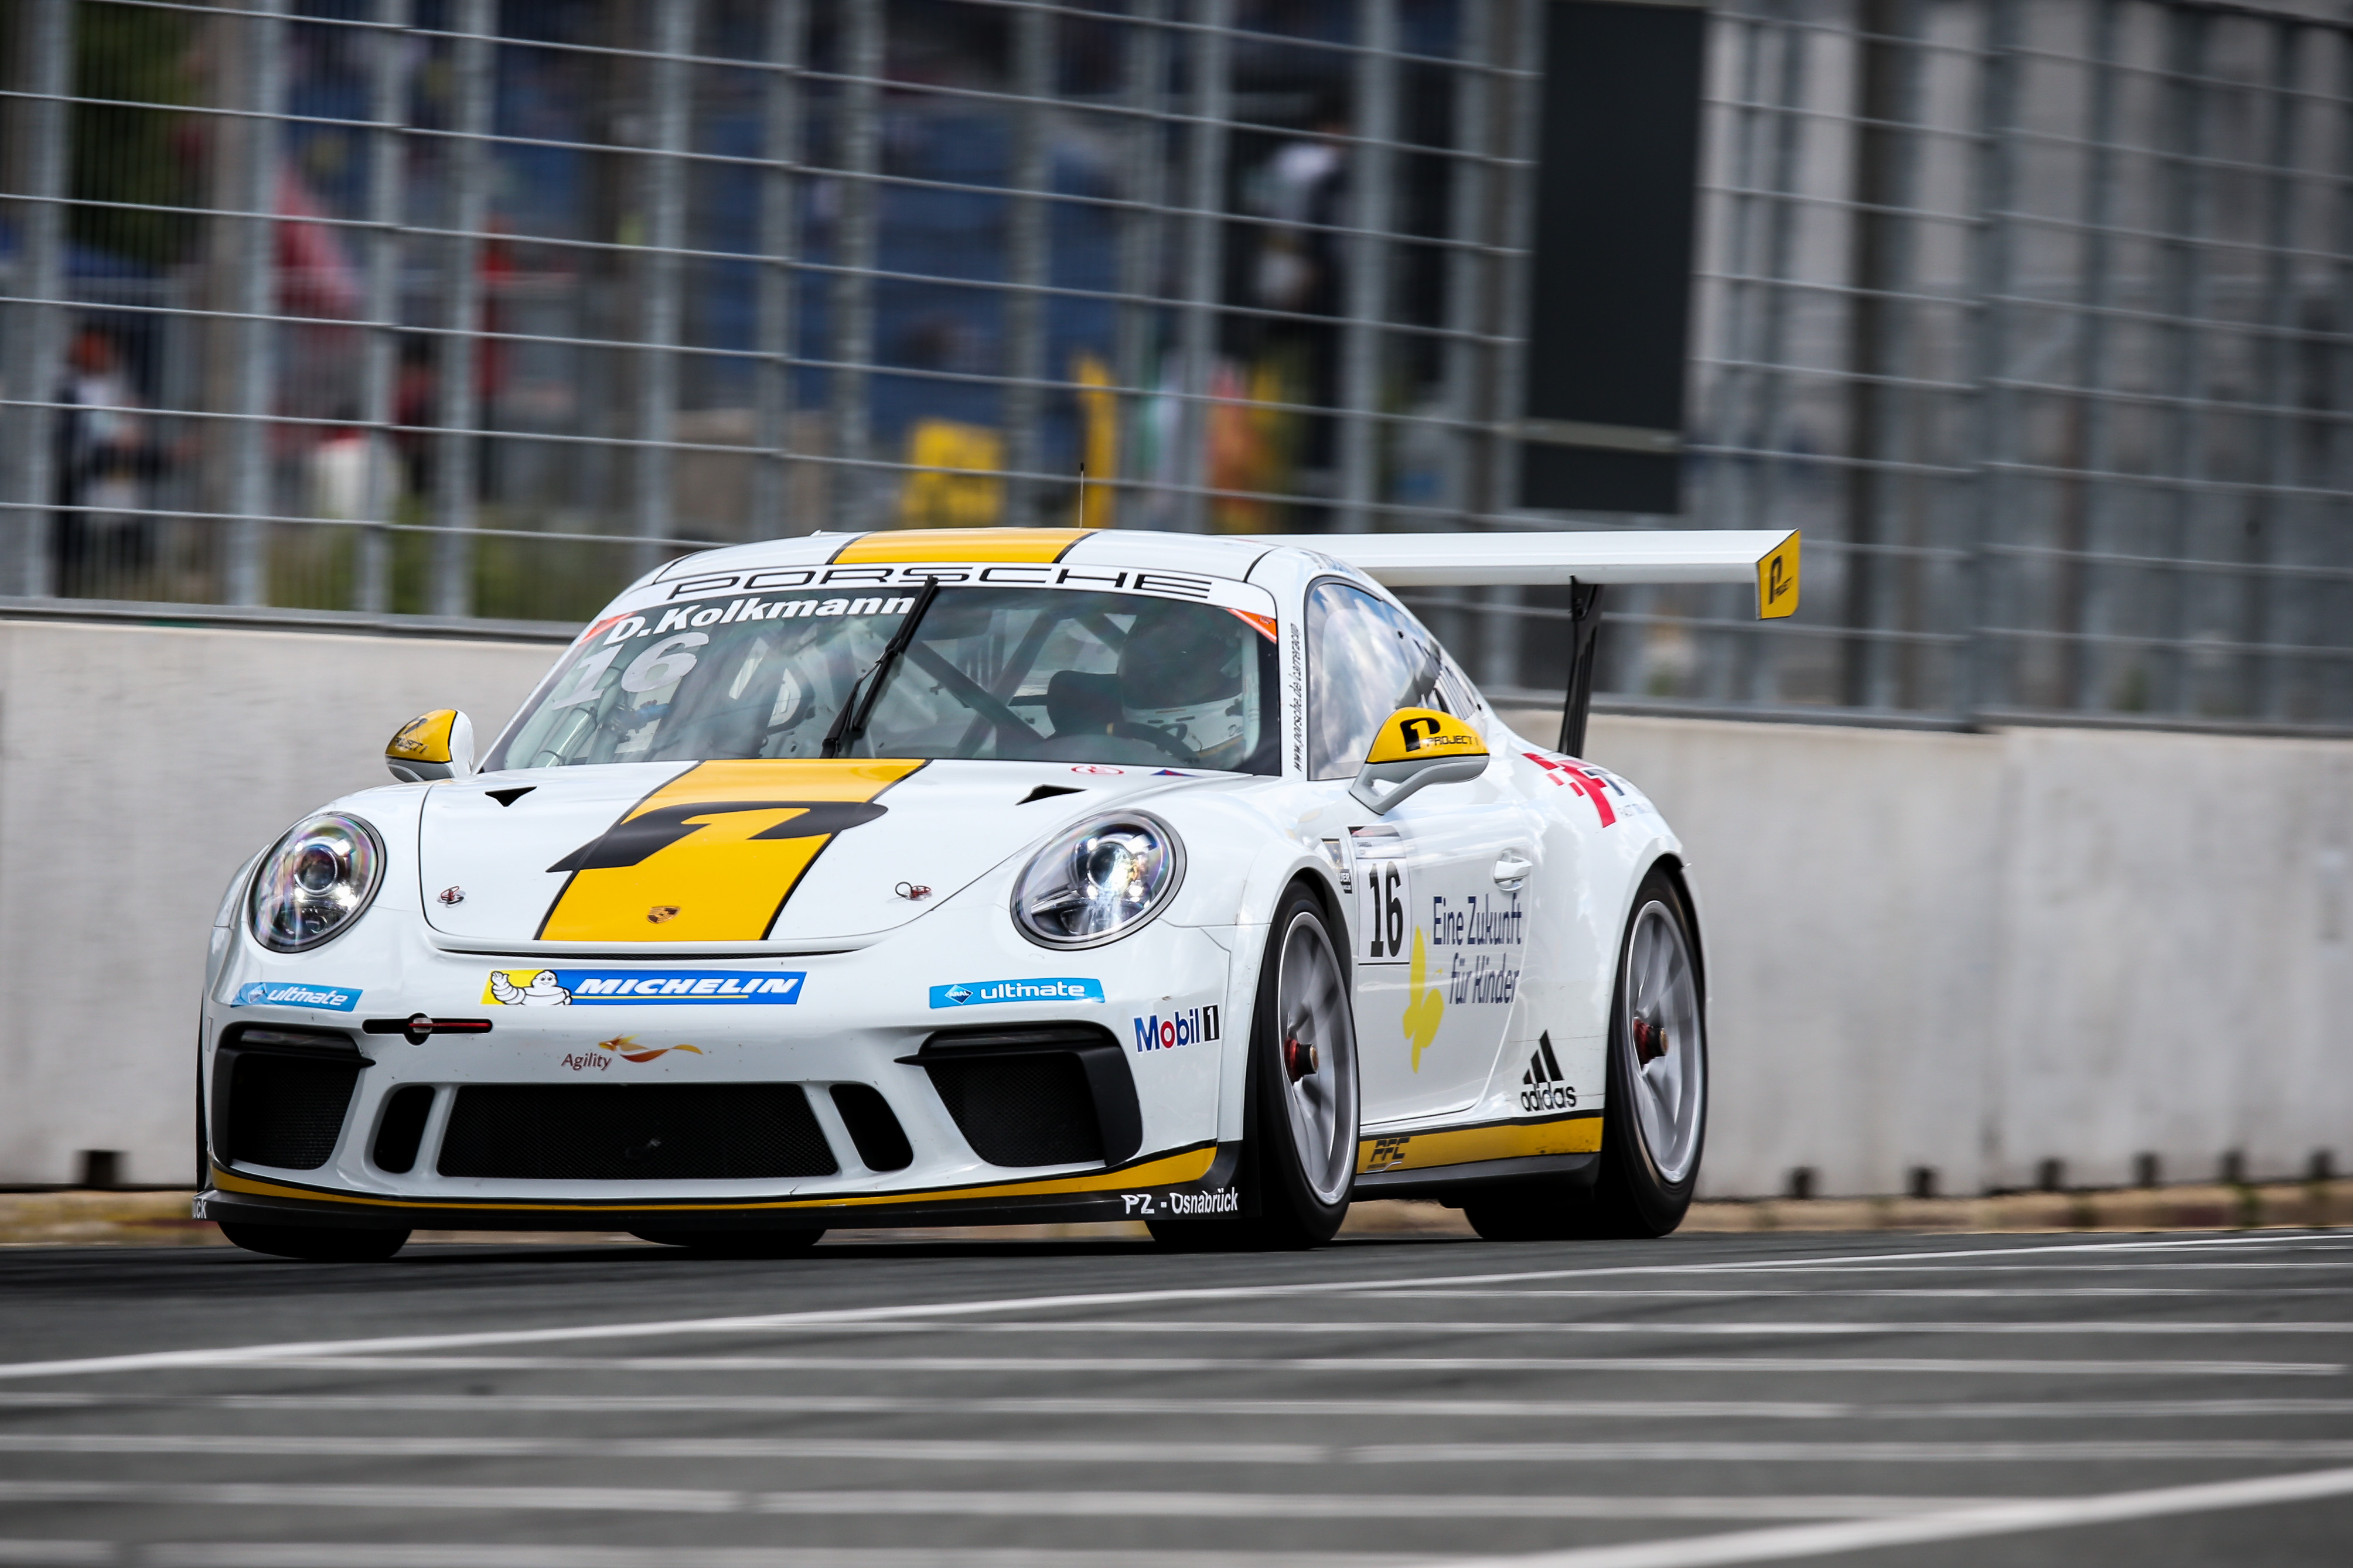 Porsche Carrera Cup, 7. + 8. Lauf 2017, Norisring - Foto: Gruppe C Photography